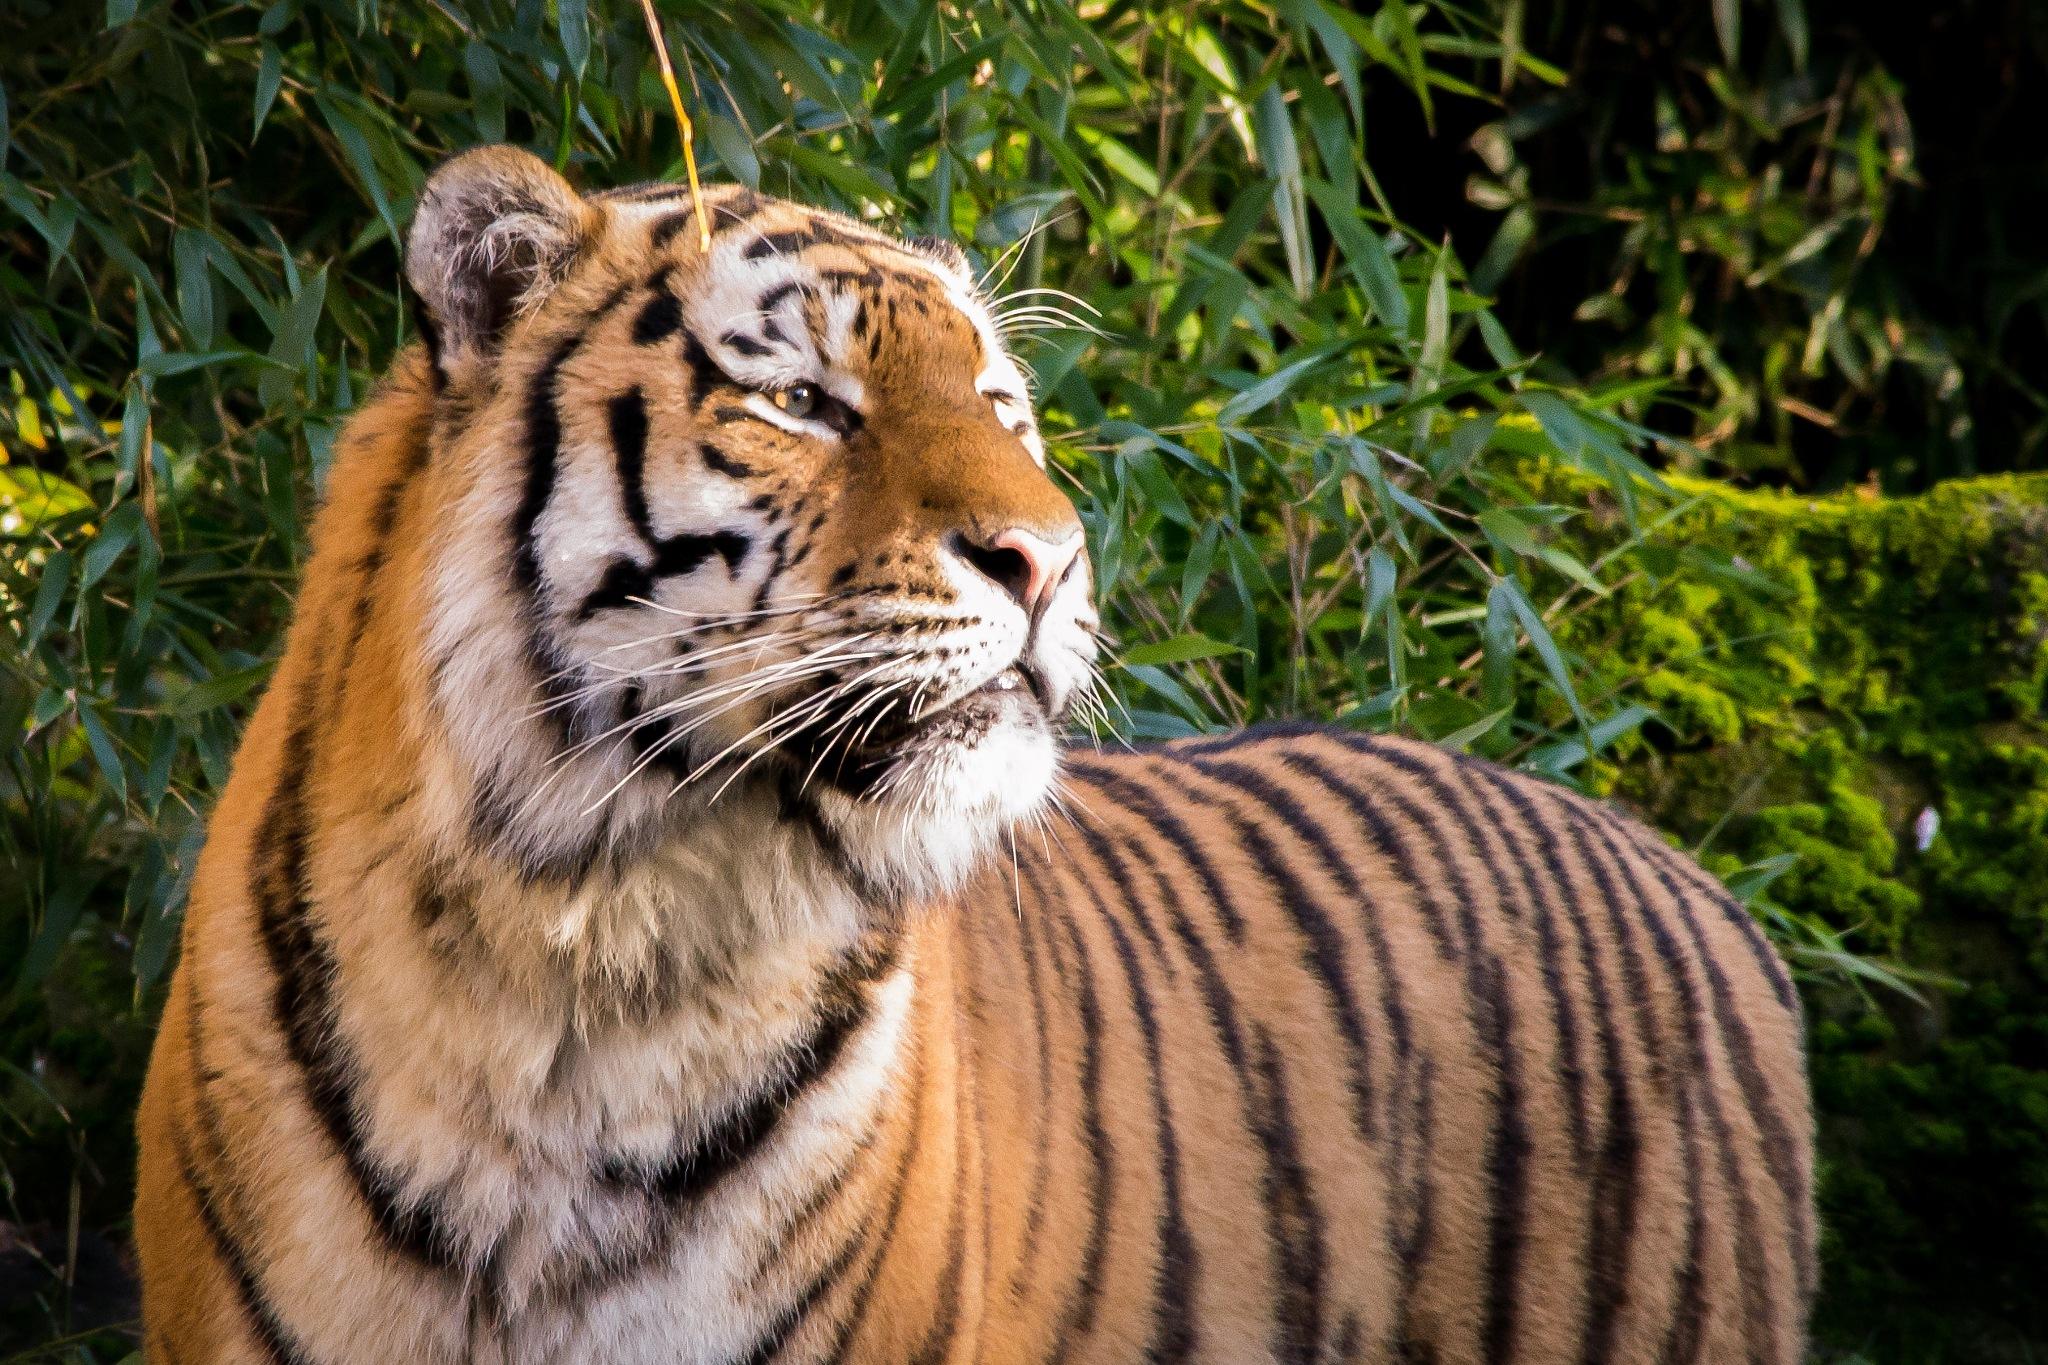 Tiger by Christian Thomas